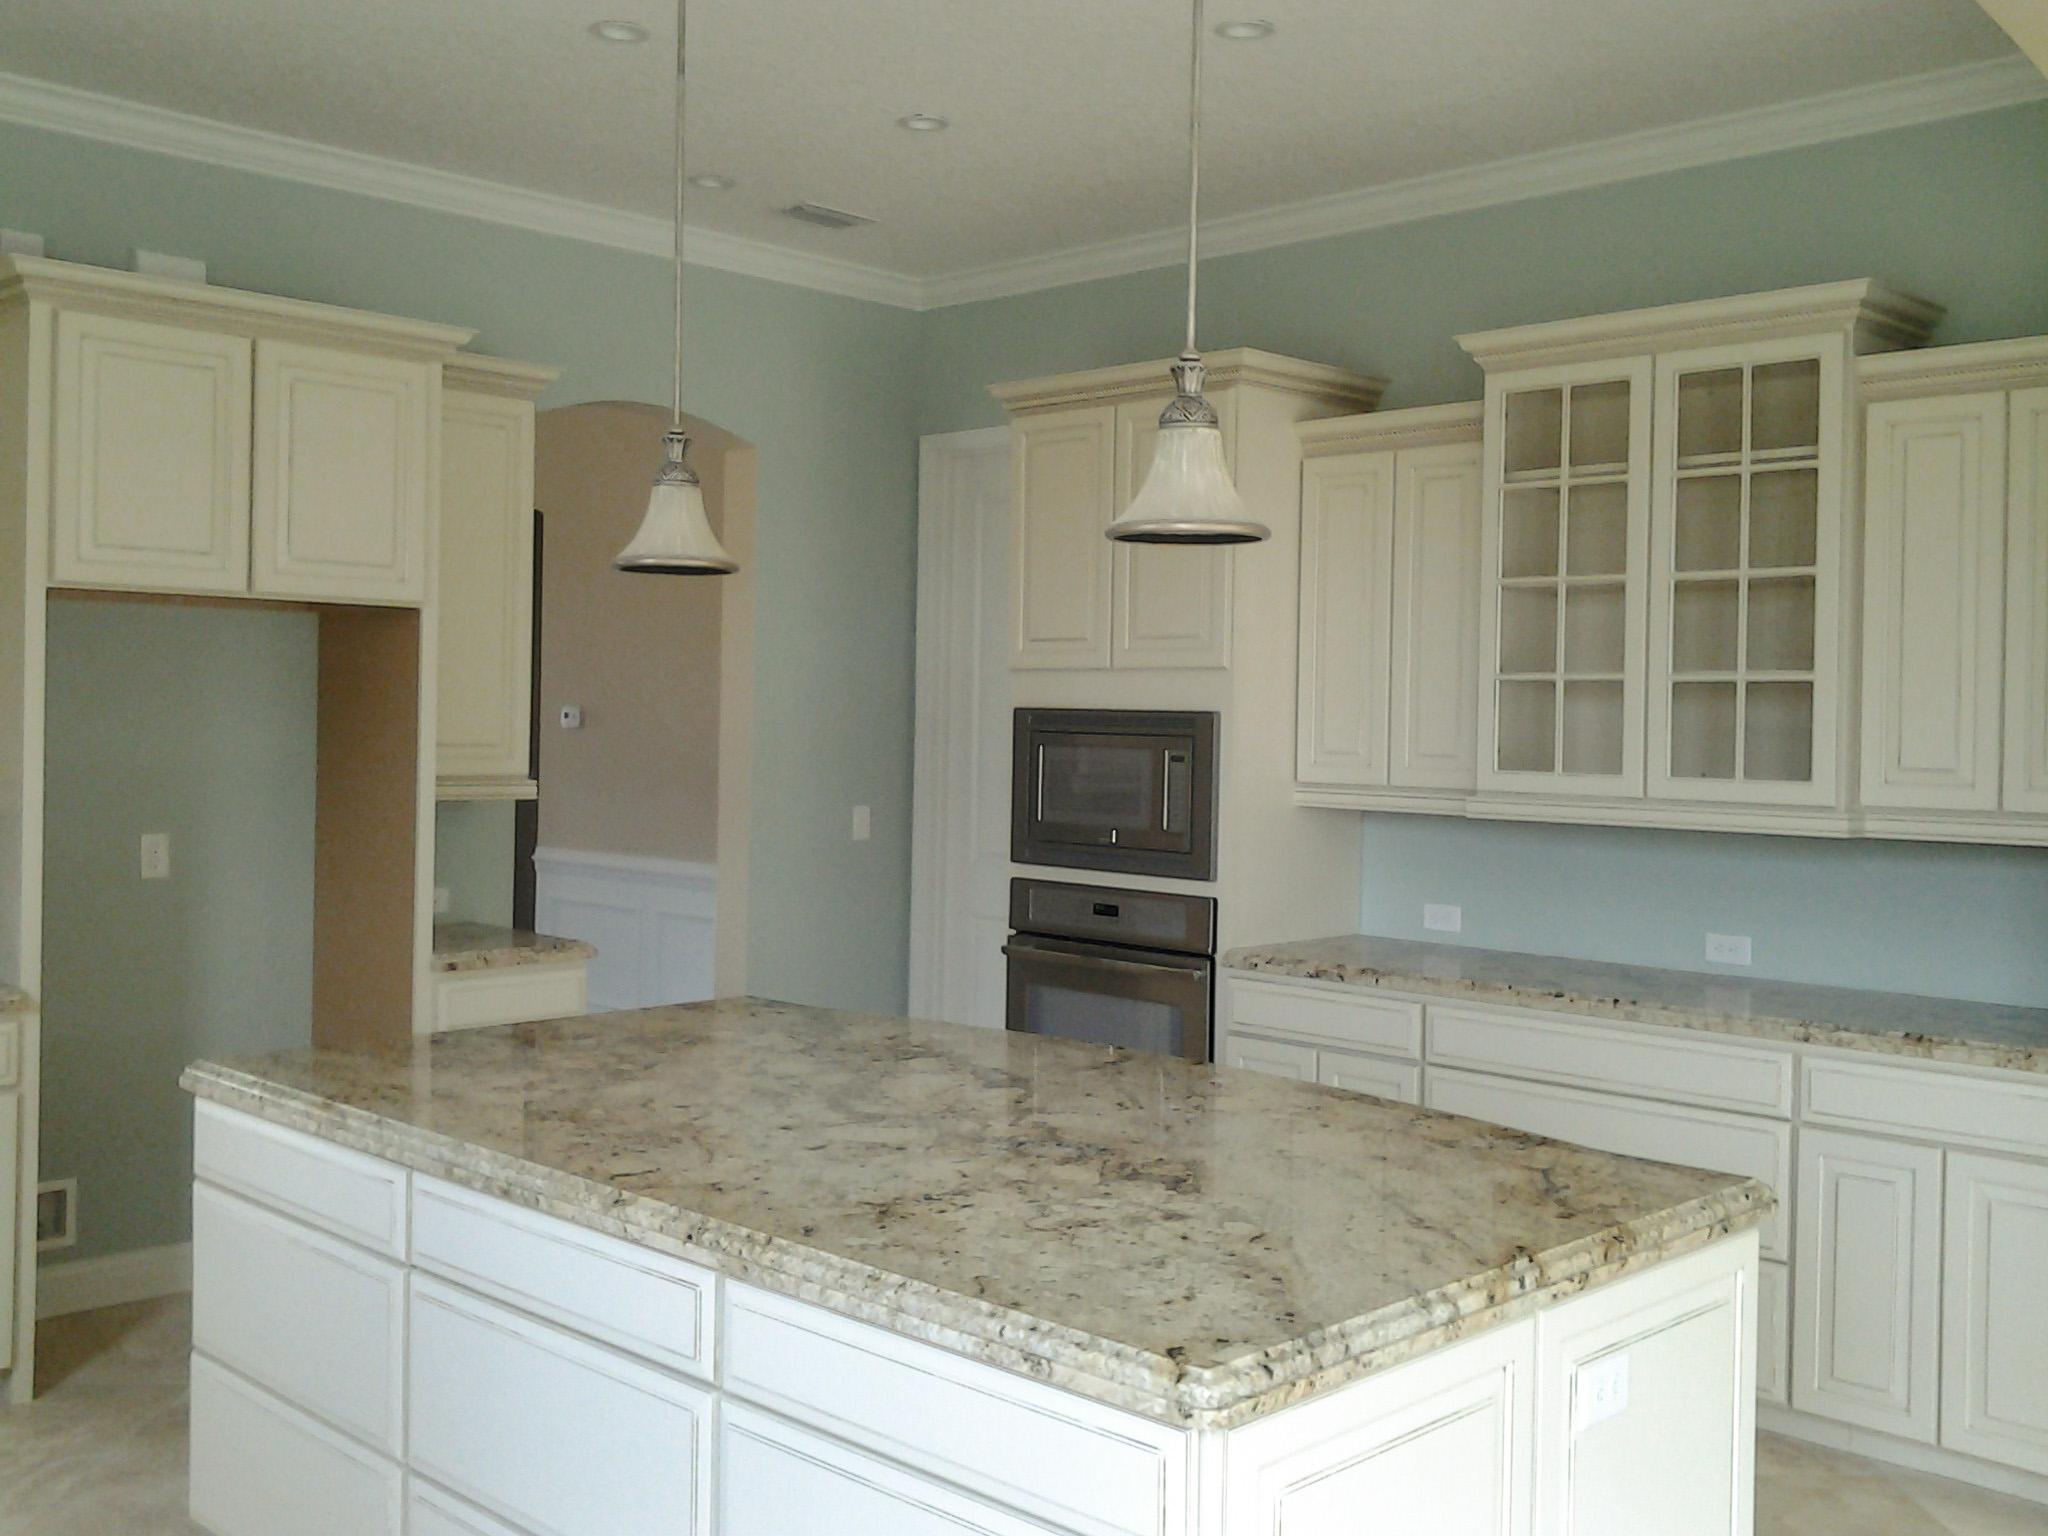 kitchen cabinets contractors jacksonville florida kitchen remodeling delta c construction inc